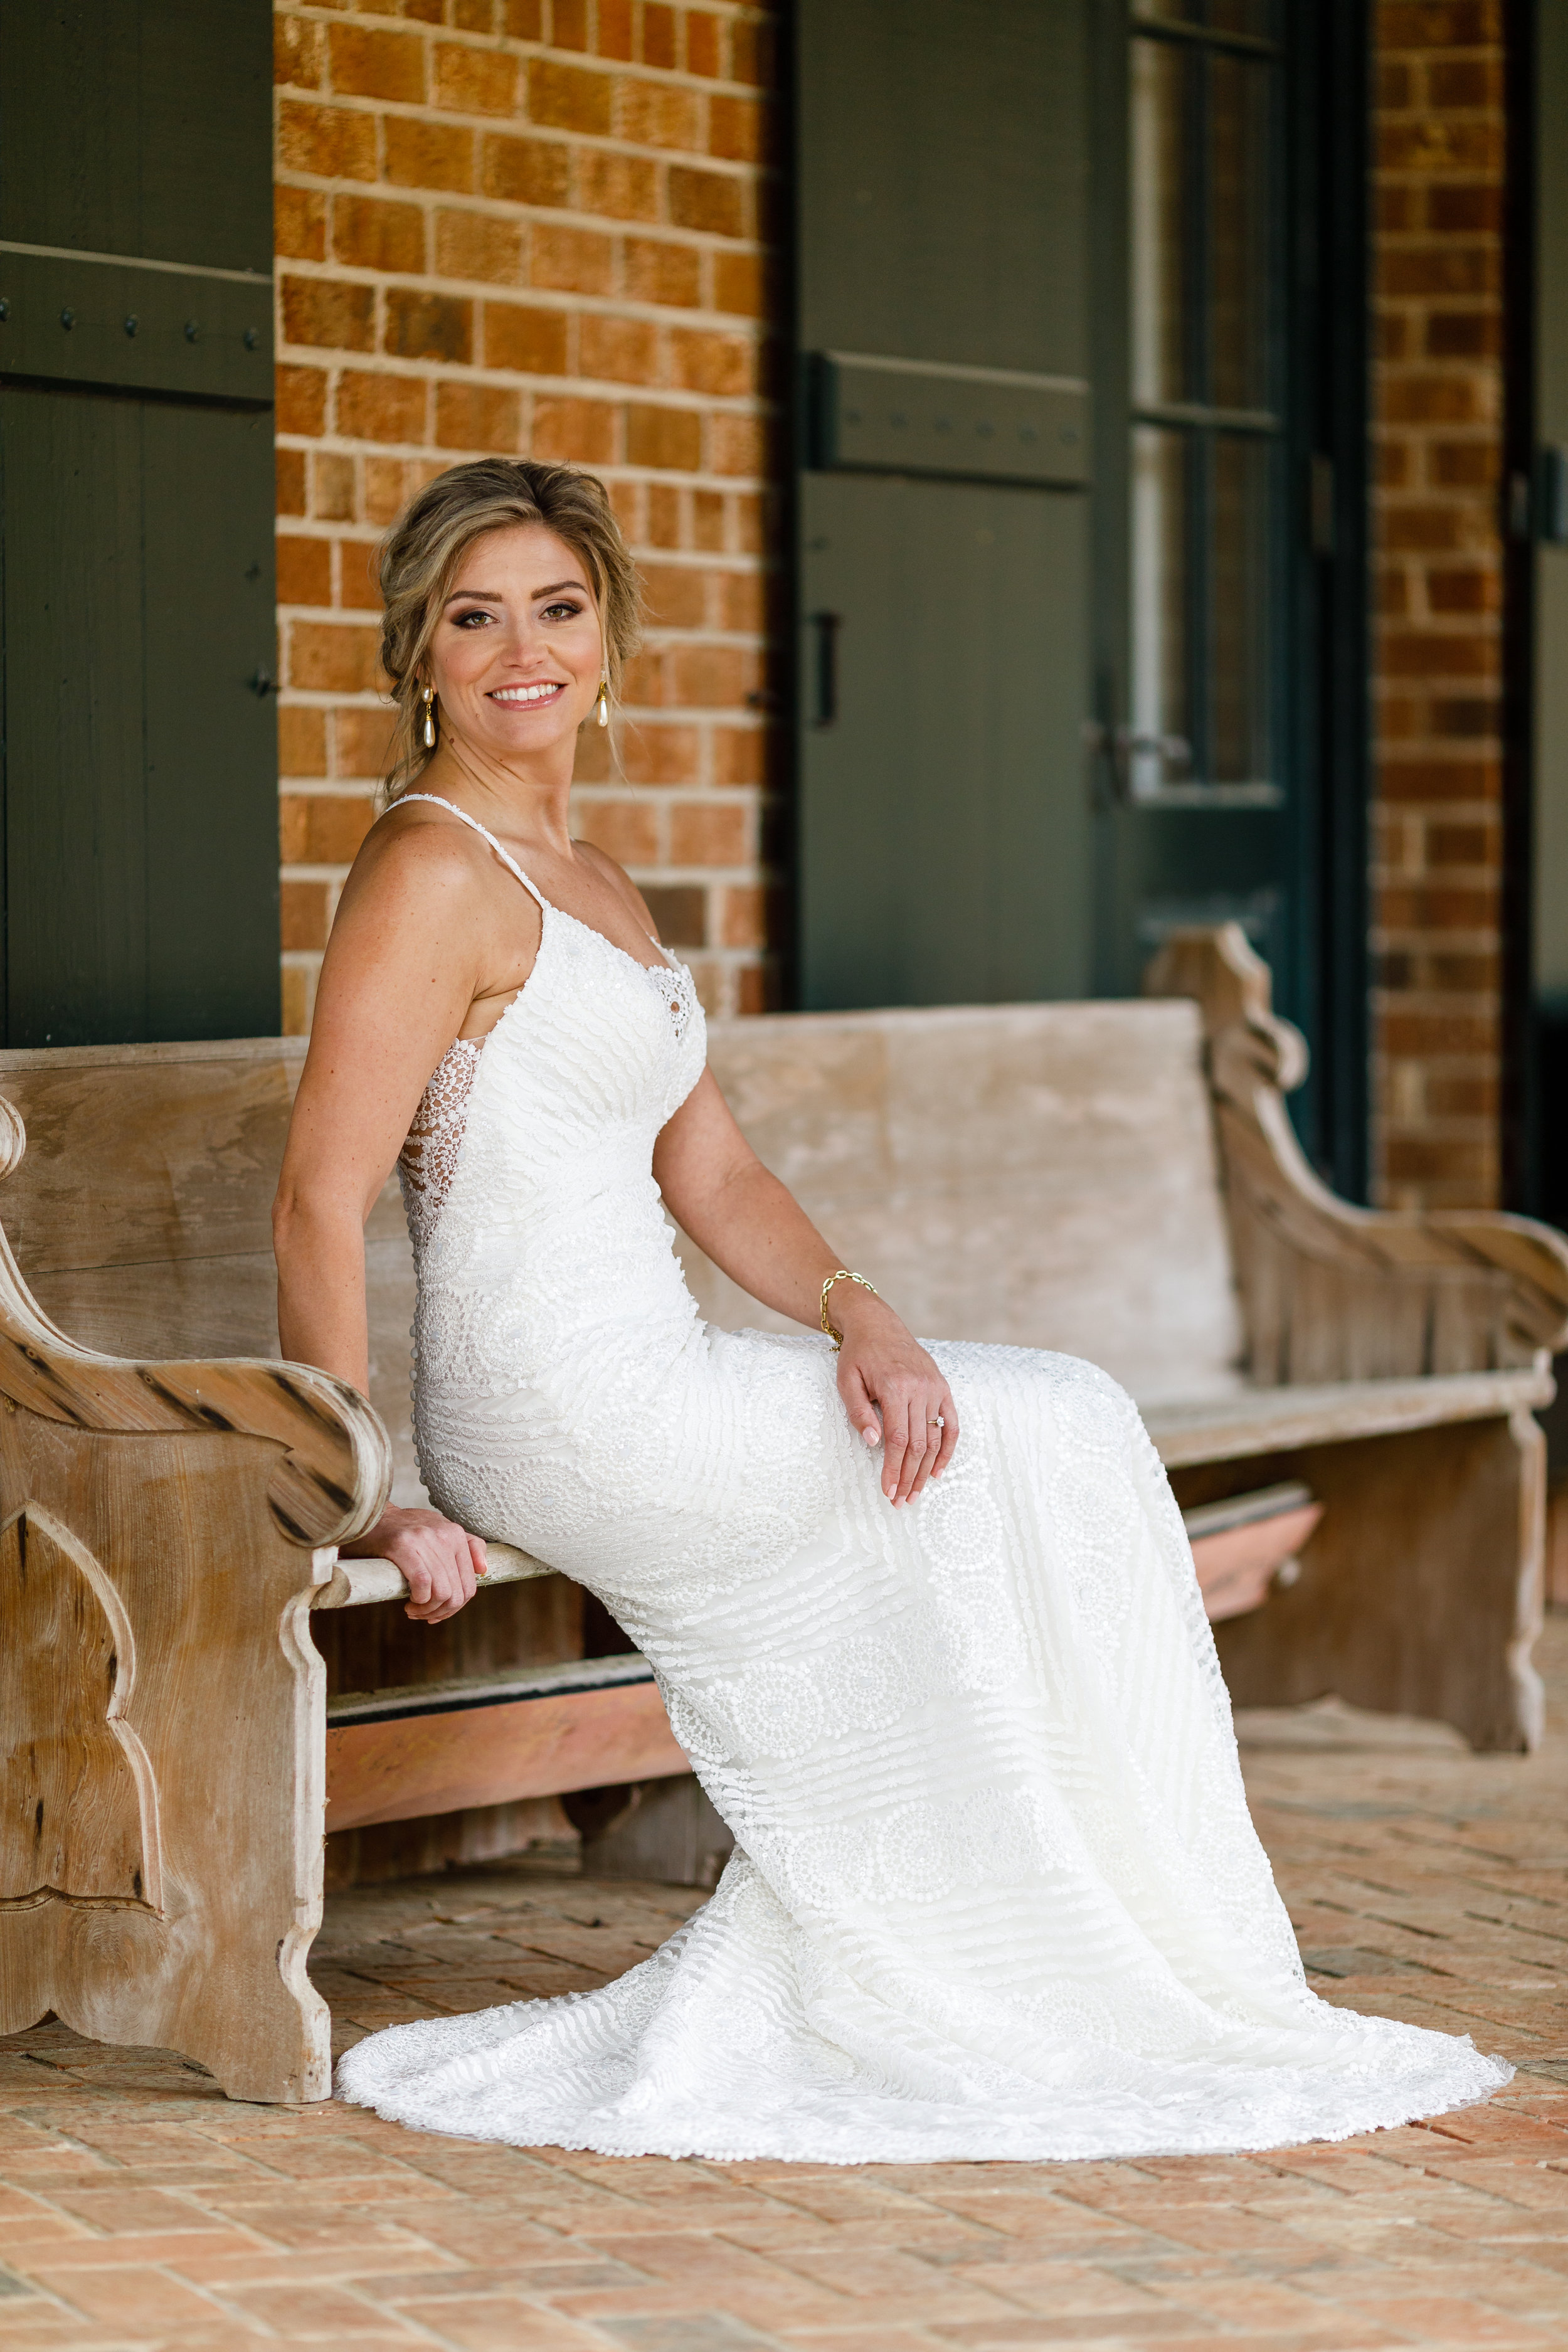 Youngsville-lafayette-portrait-family-wedding-photographer-2818.jpg